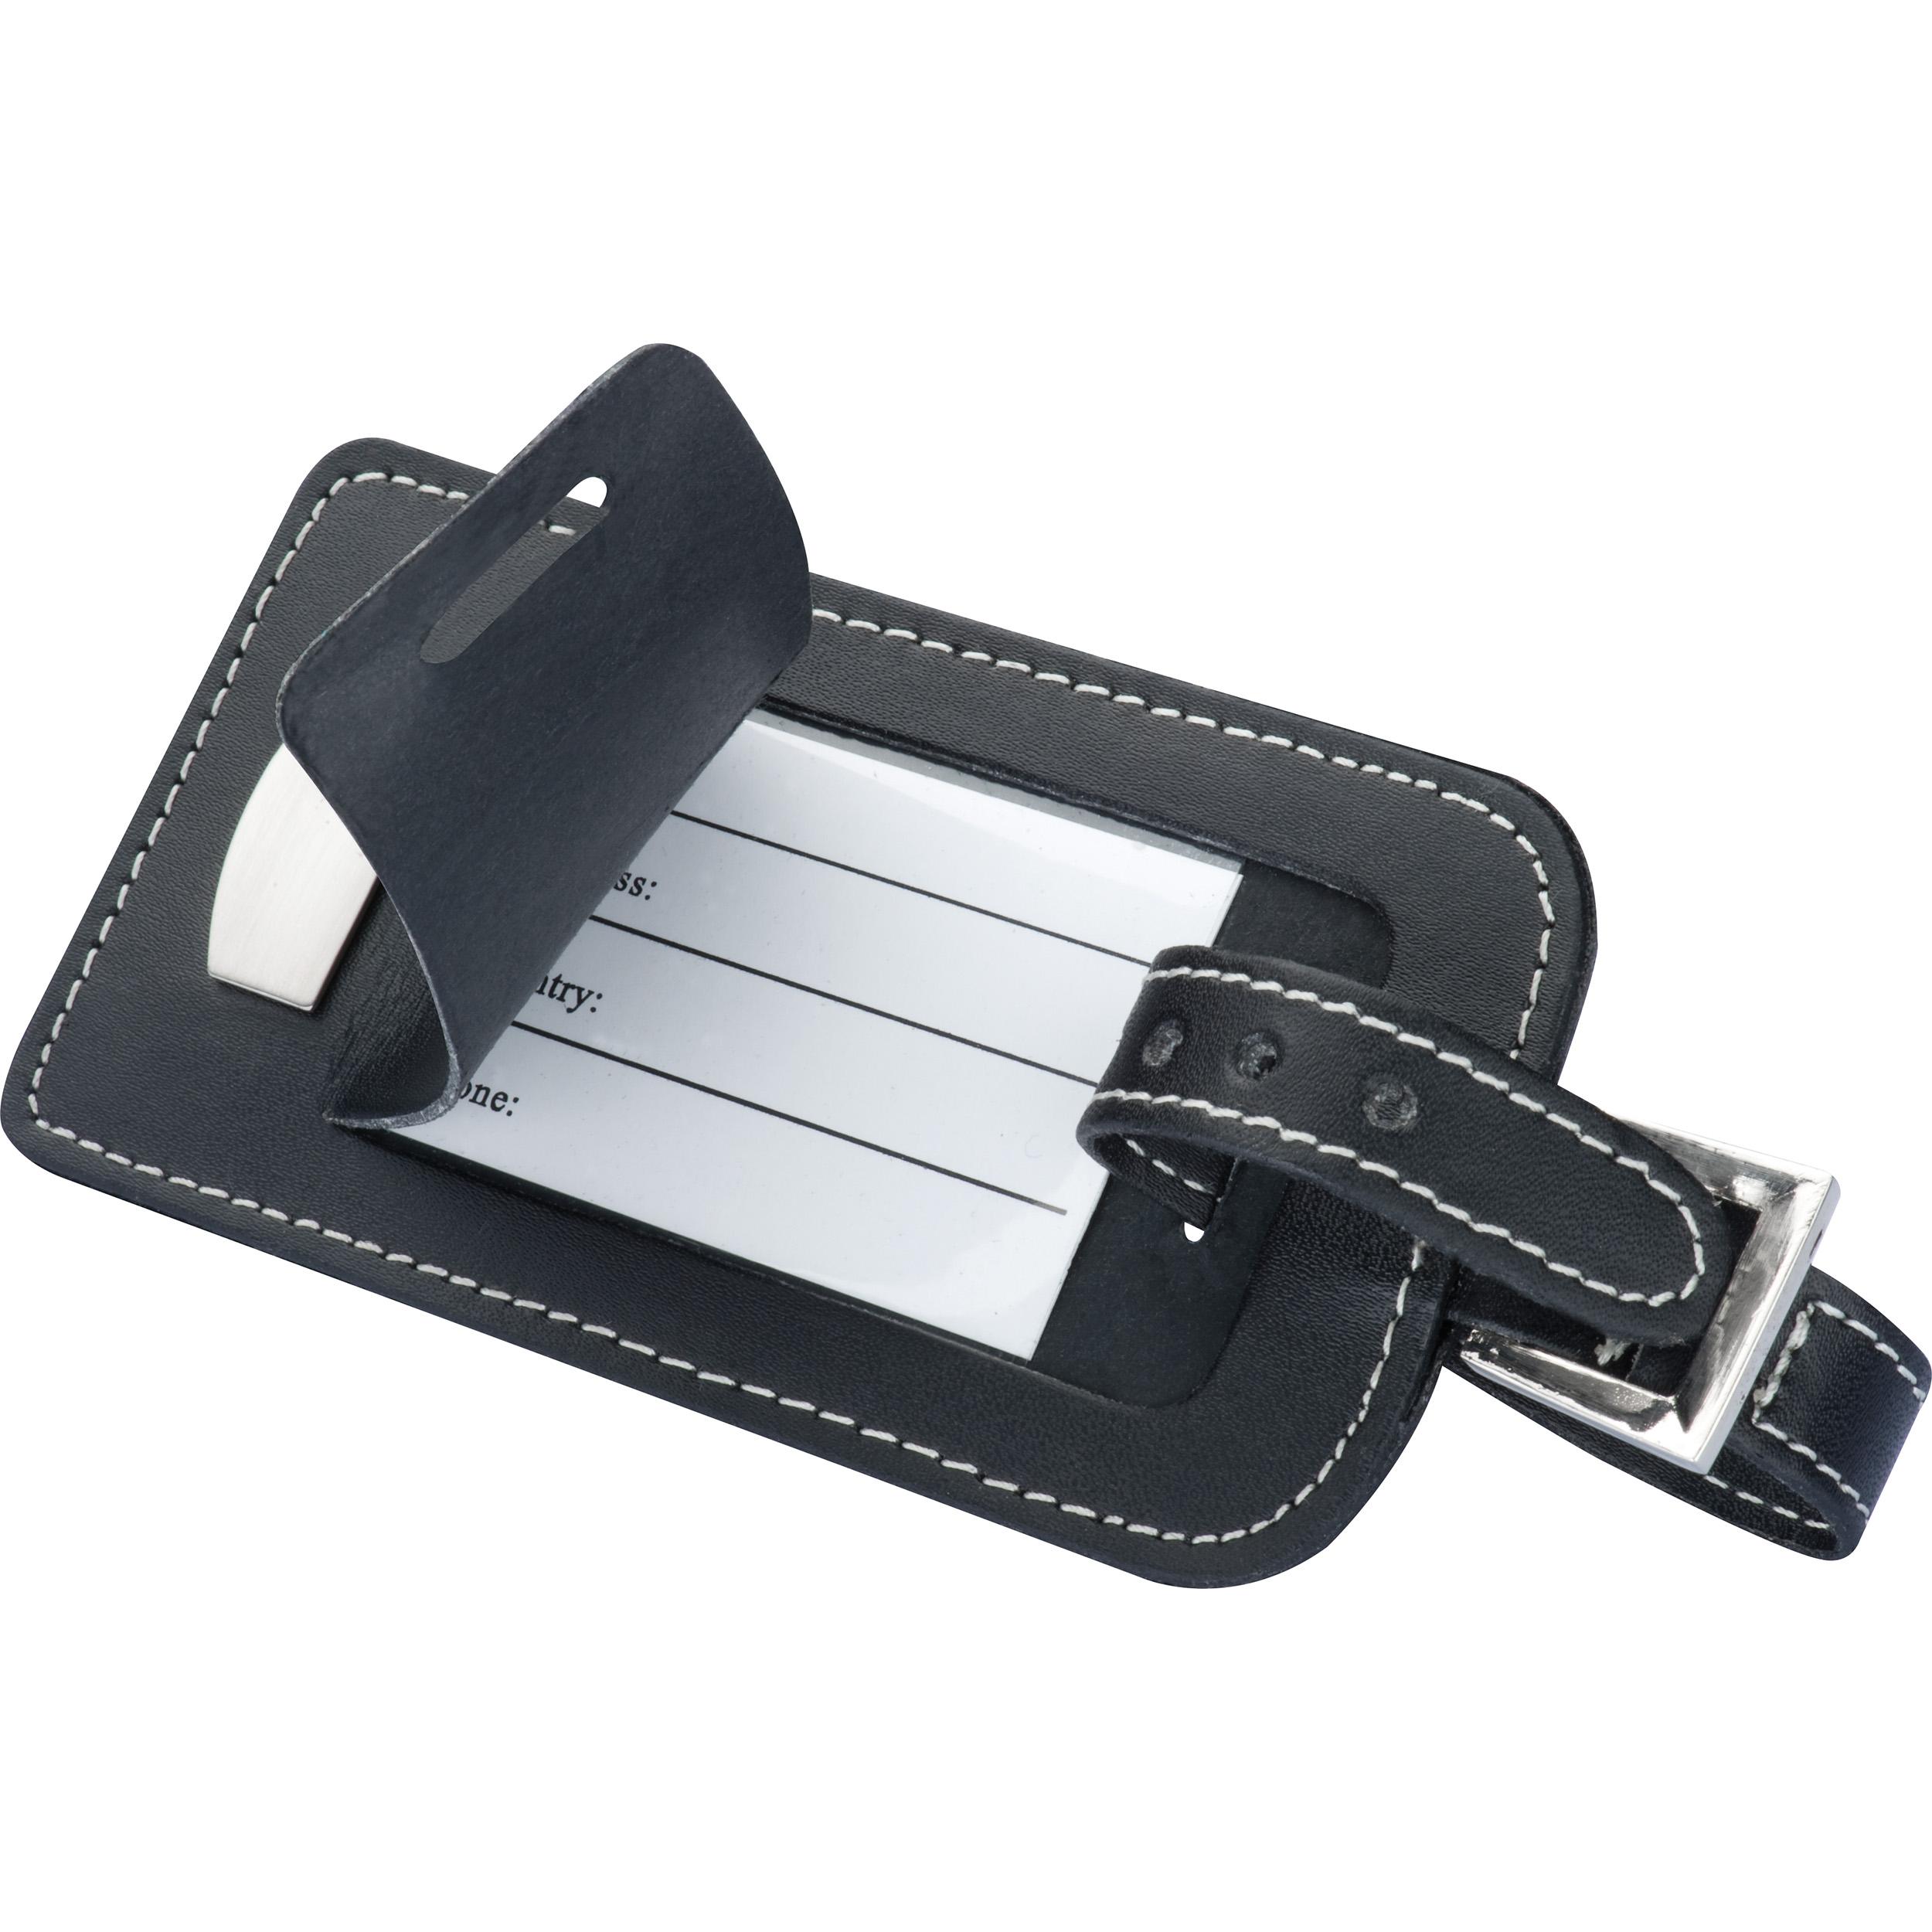 CrisMa bonded-leather luggage tag